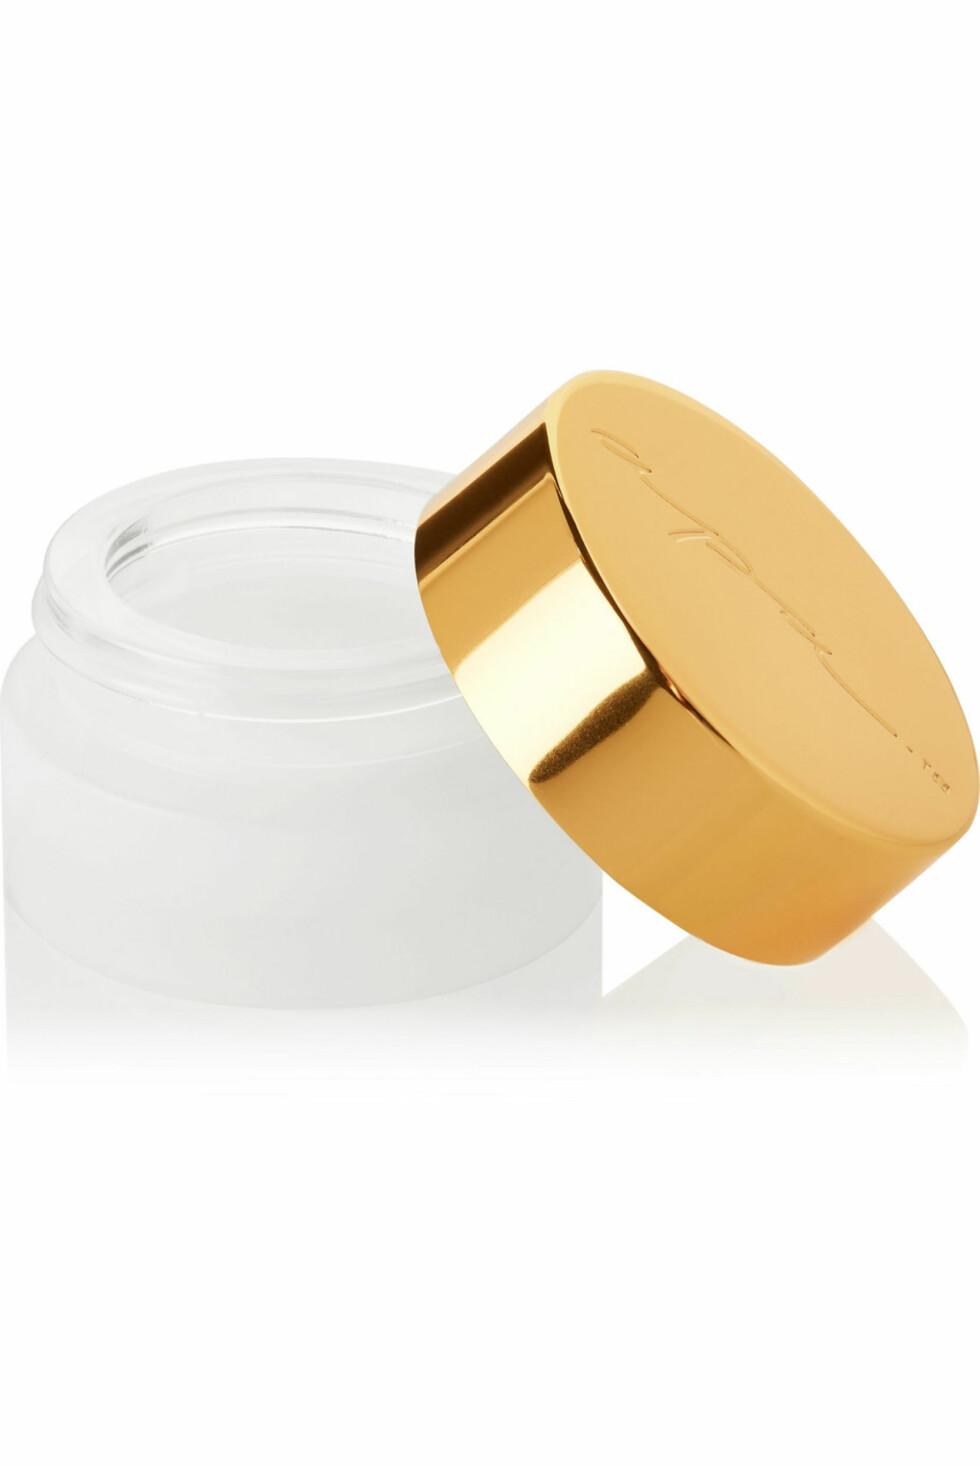 Leppebalm fra Apa Beauty |344,-| https://www.net-a-porter.com/no/en/product/1091770/apa_beauty/lush-lip-balm